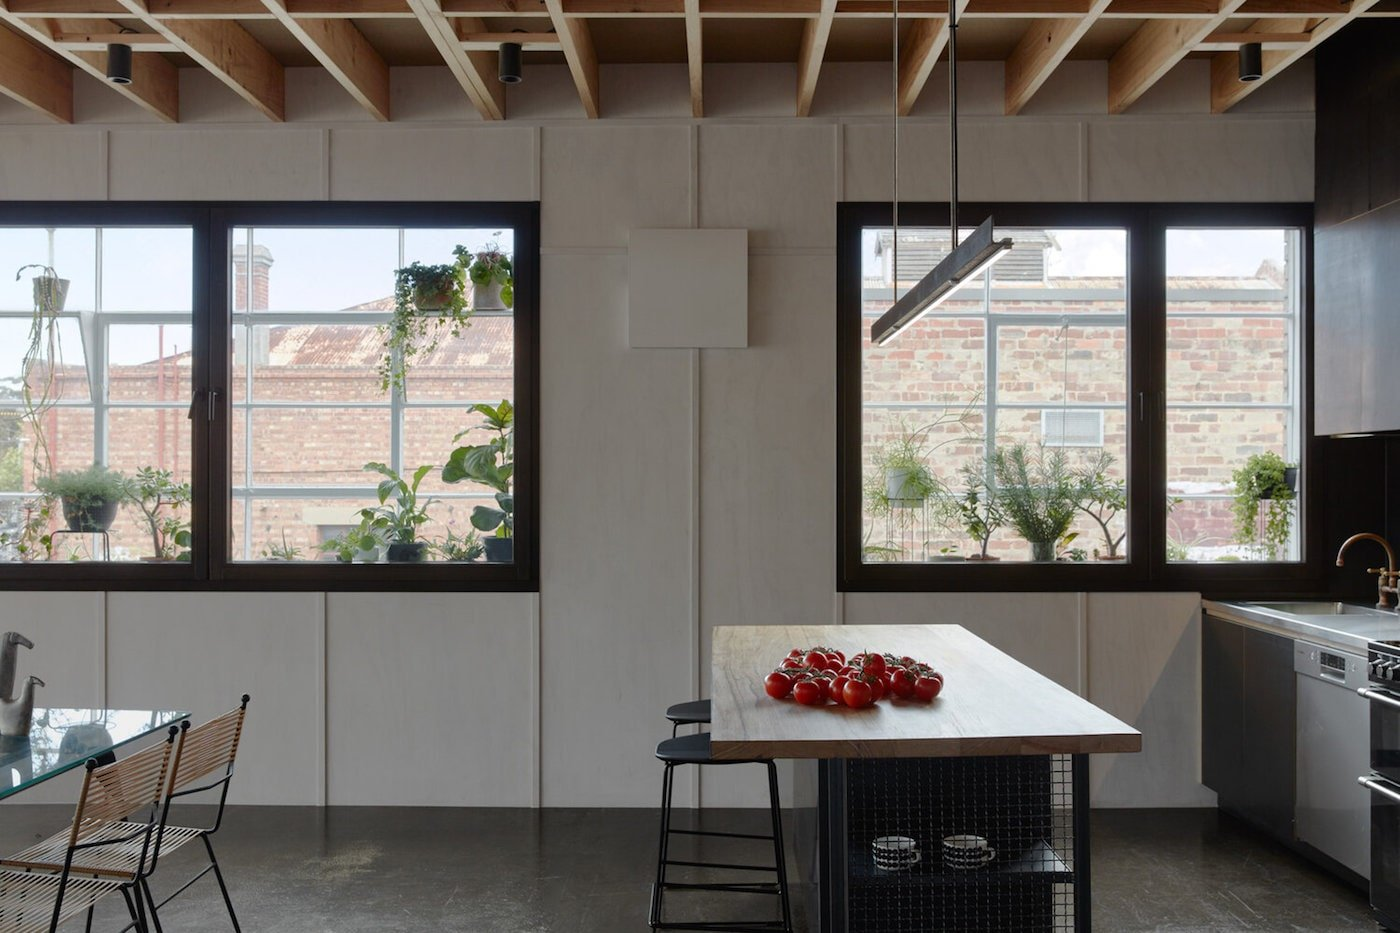 Eco Edition_Breathe Architecture_Warehouse Greenhouse_Architecture sustainability 12-min